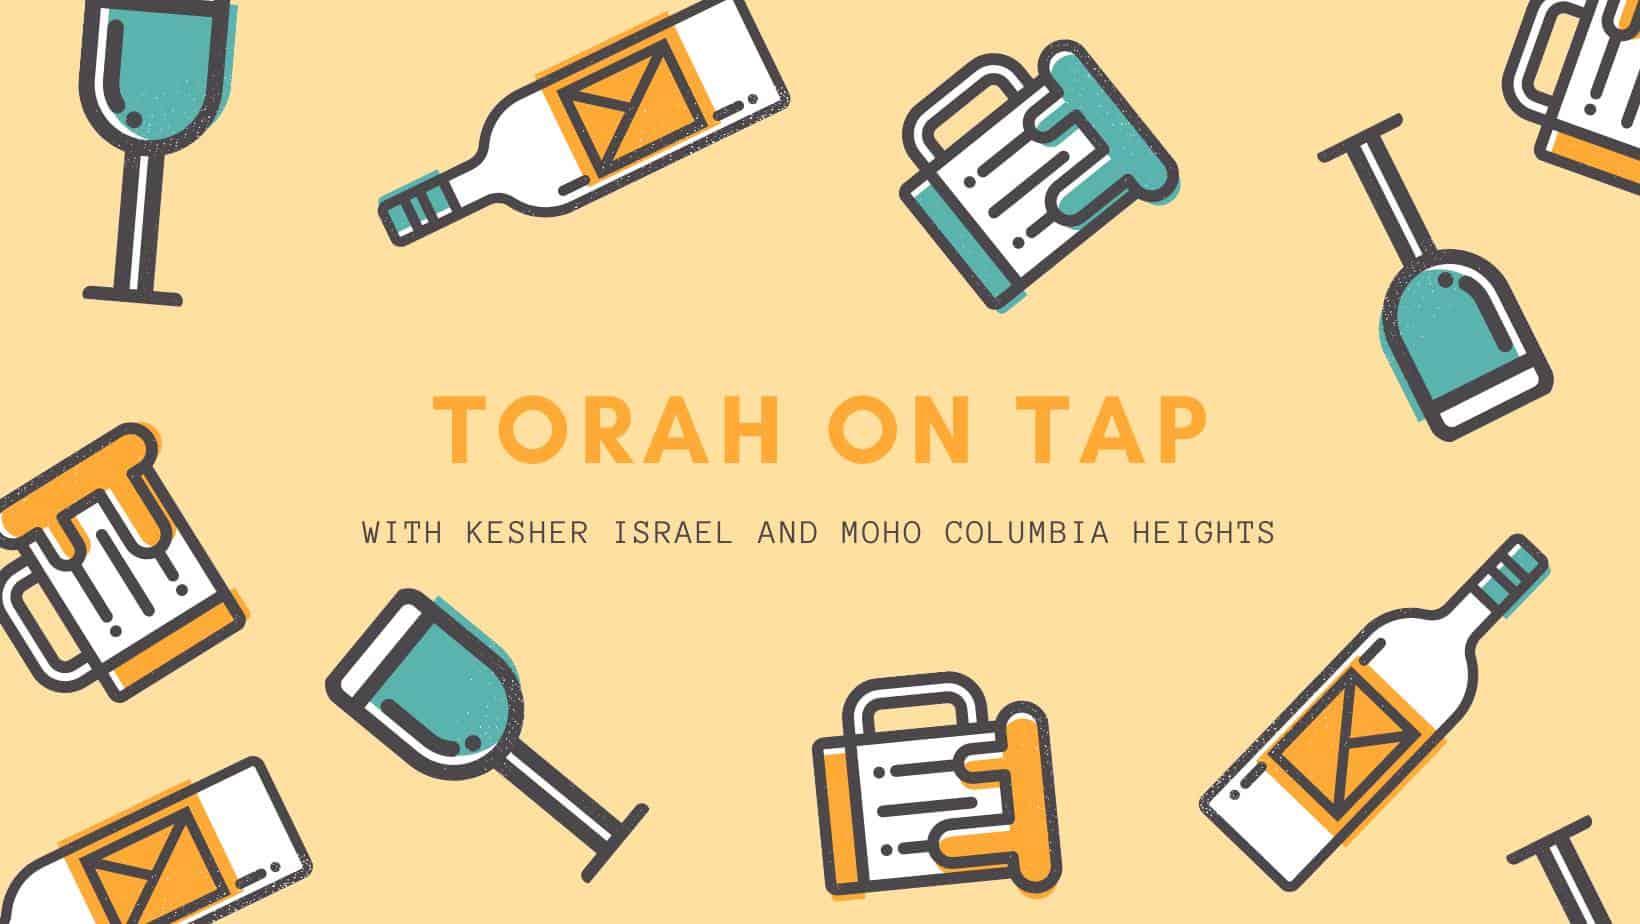 Torah on Tap